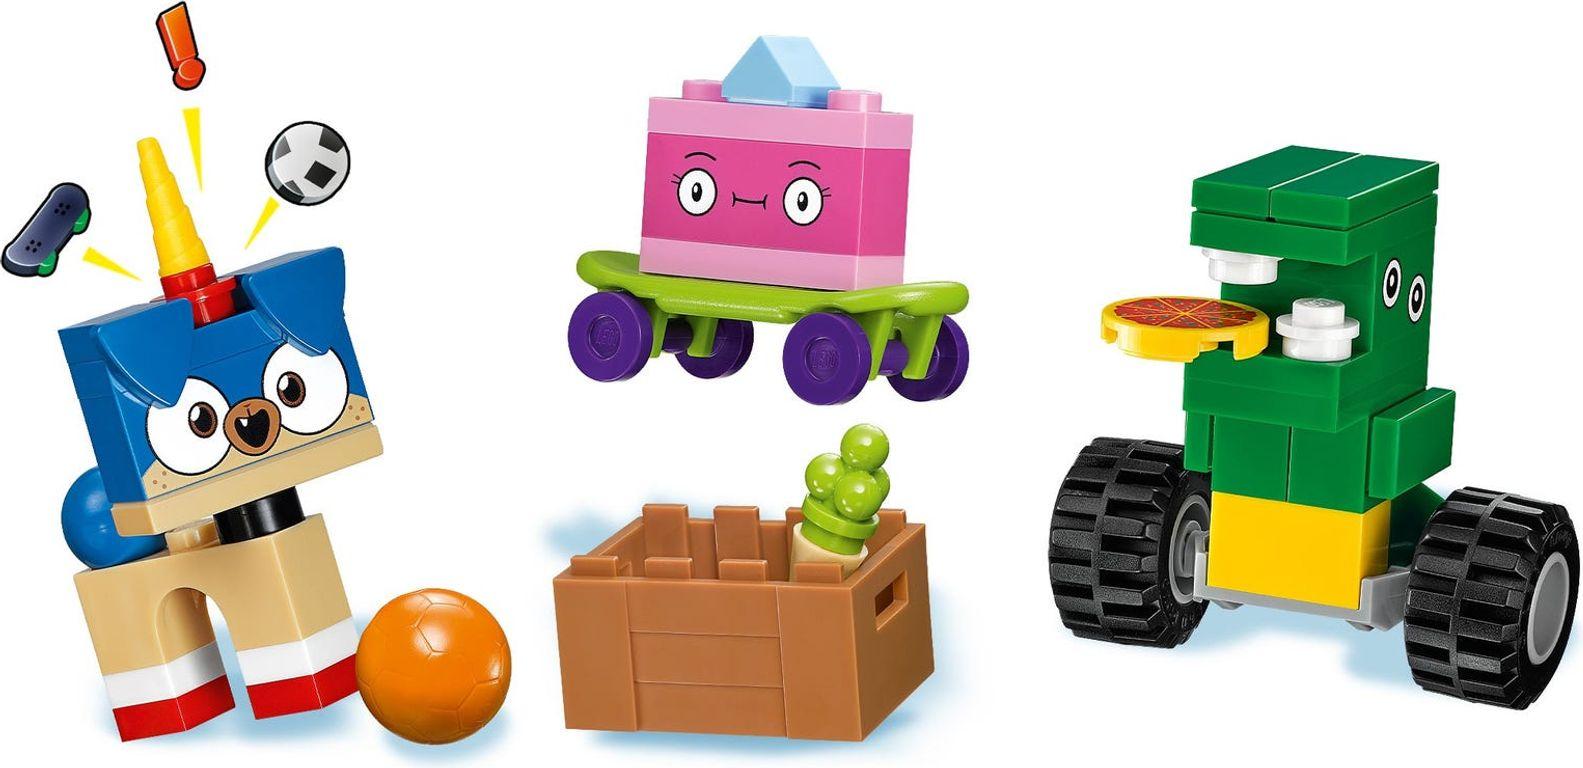 Prince Puppycorn Trike components